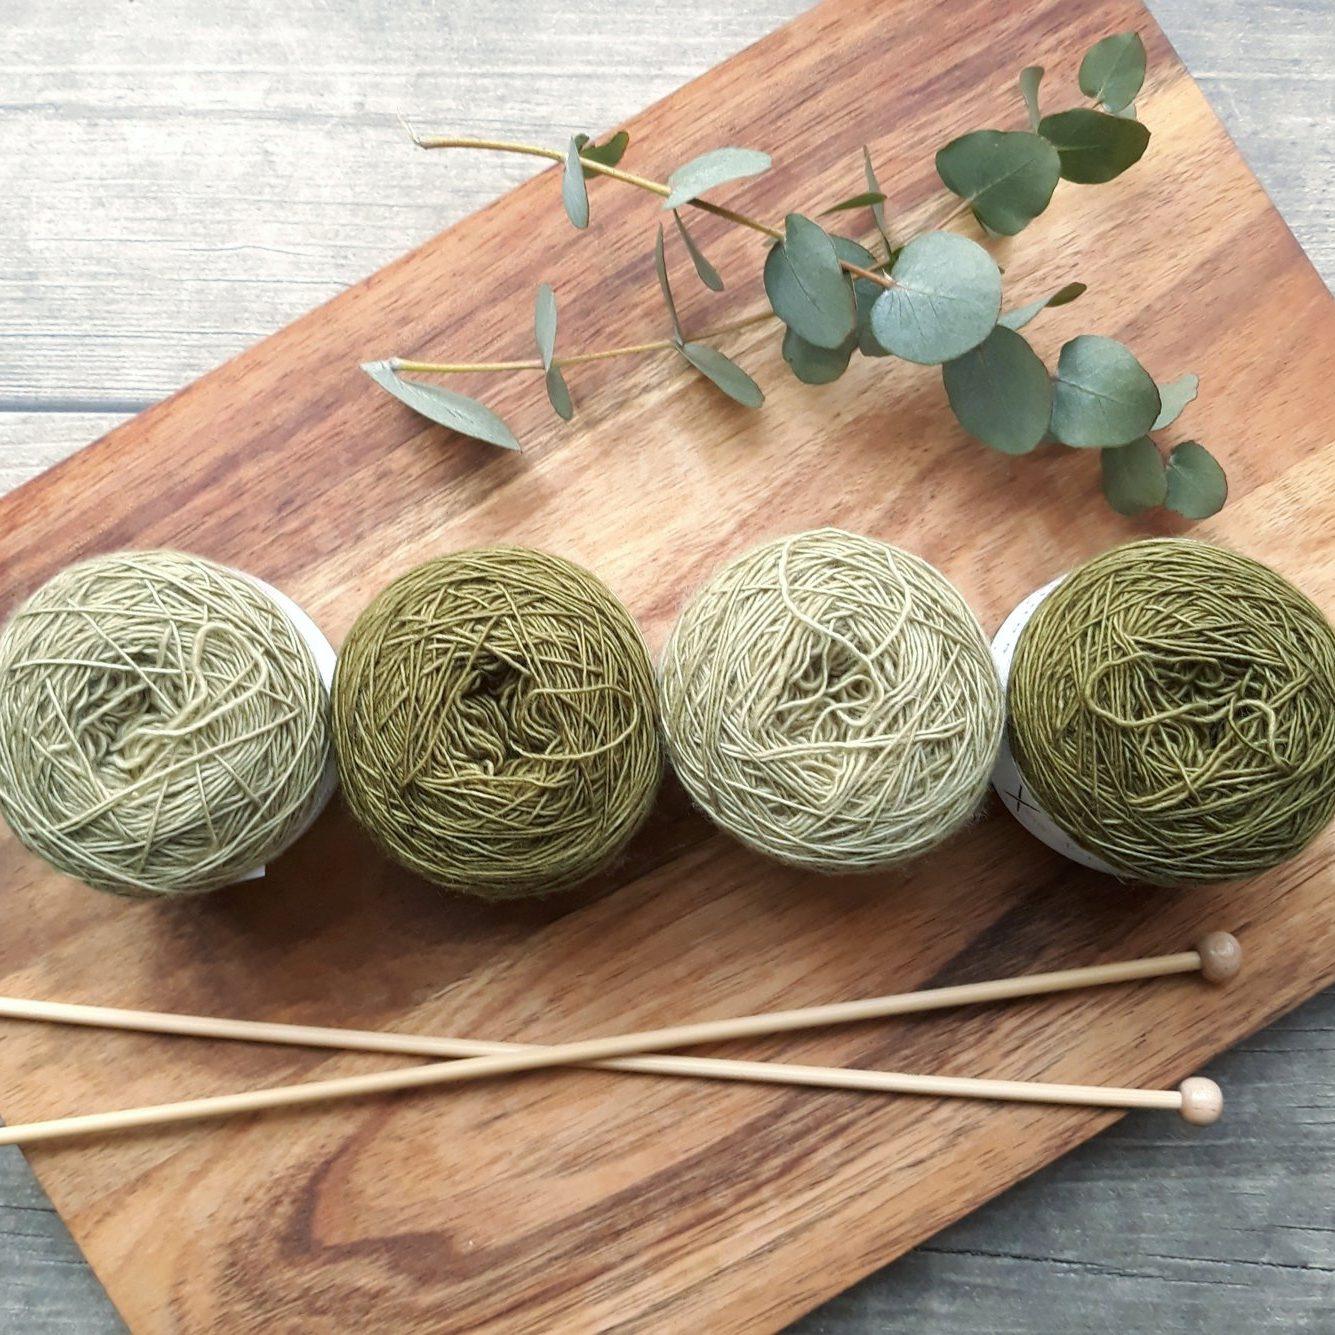 Four green balls of wool